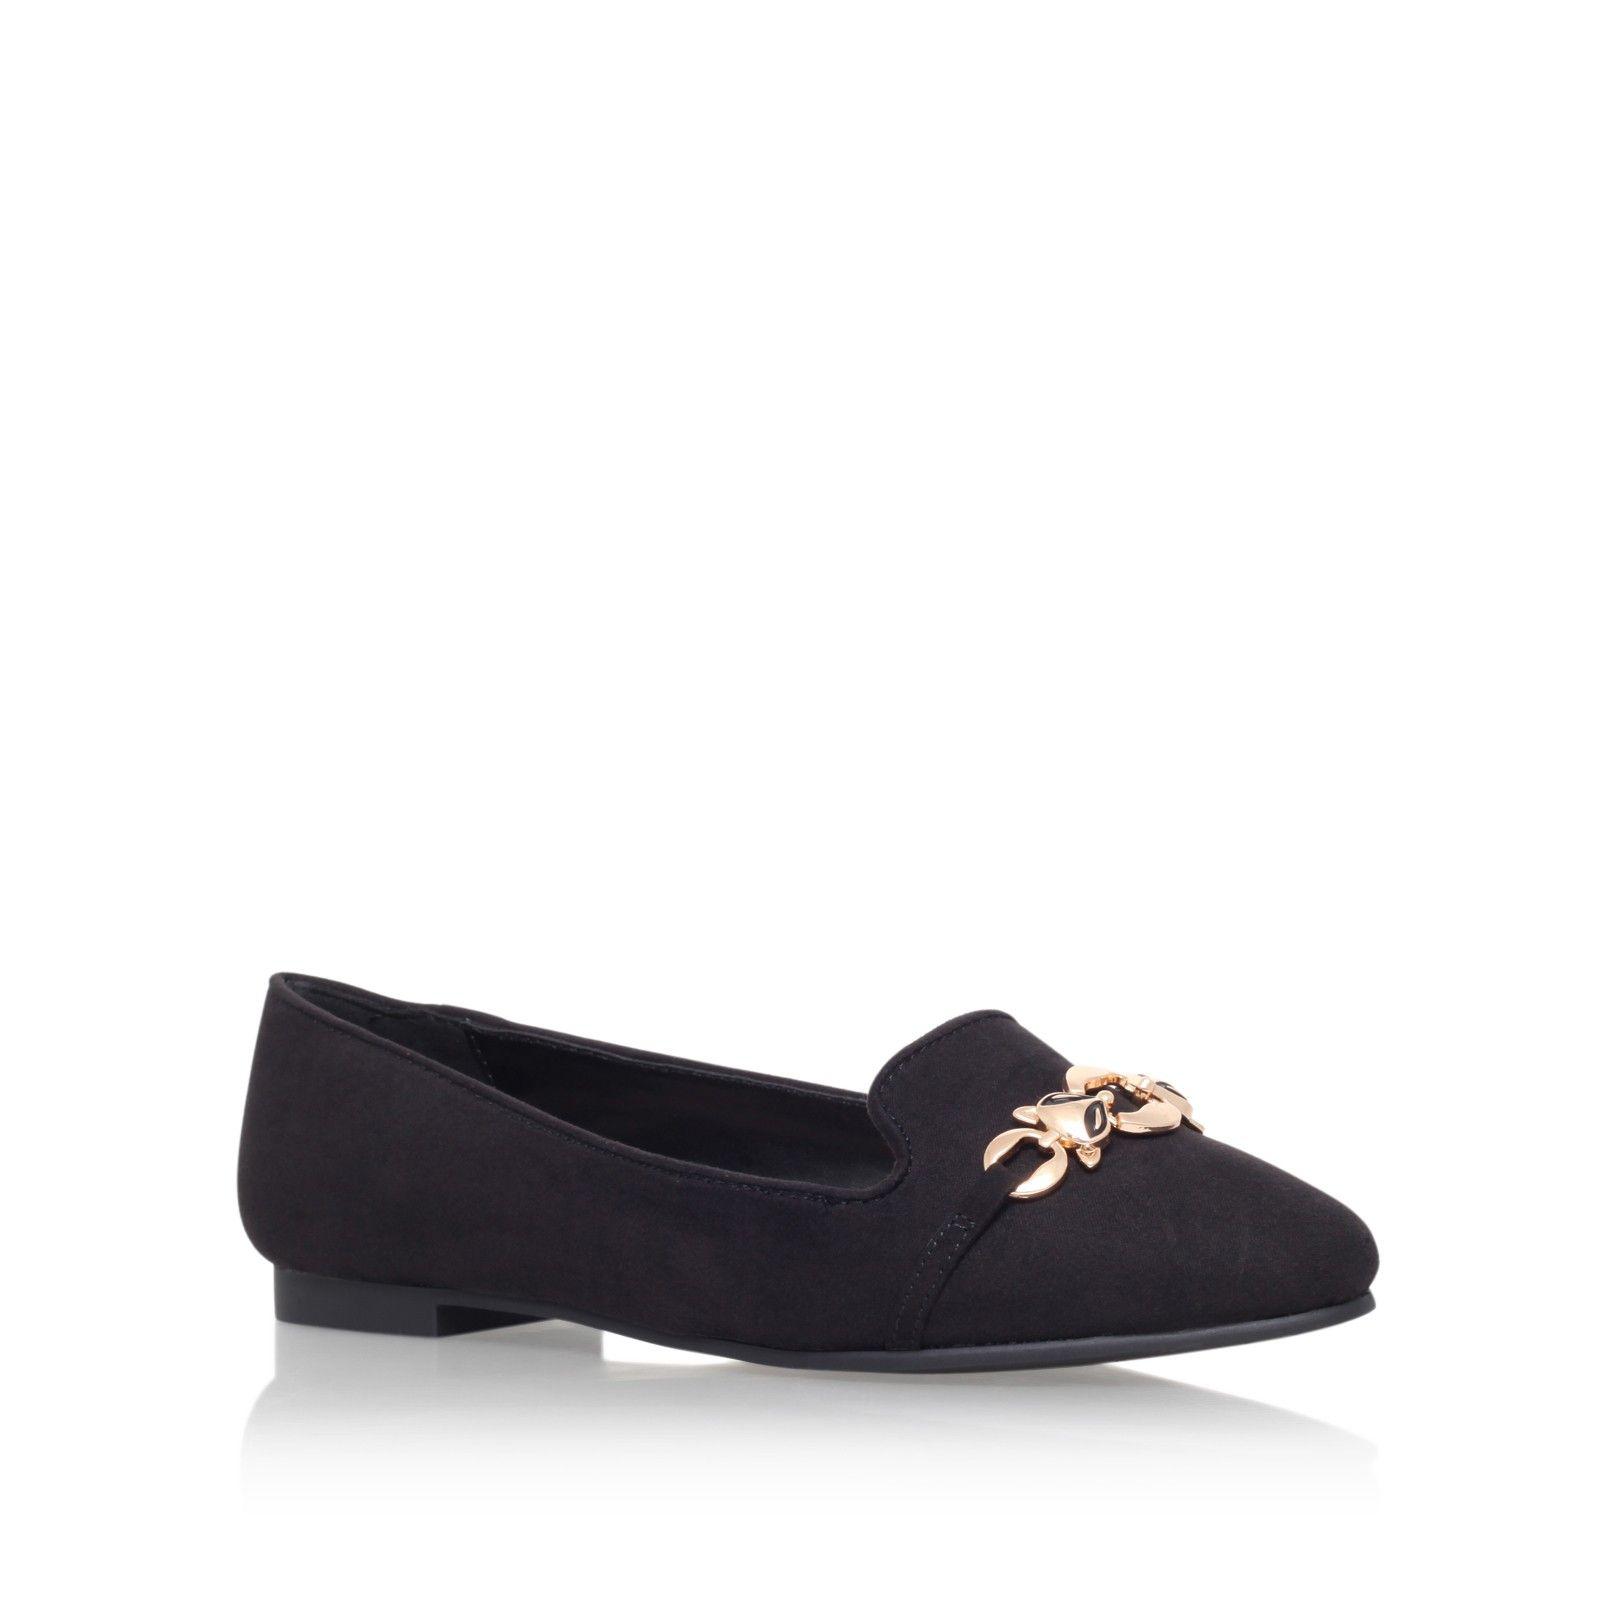 carvela flat black shoes